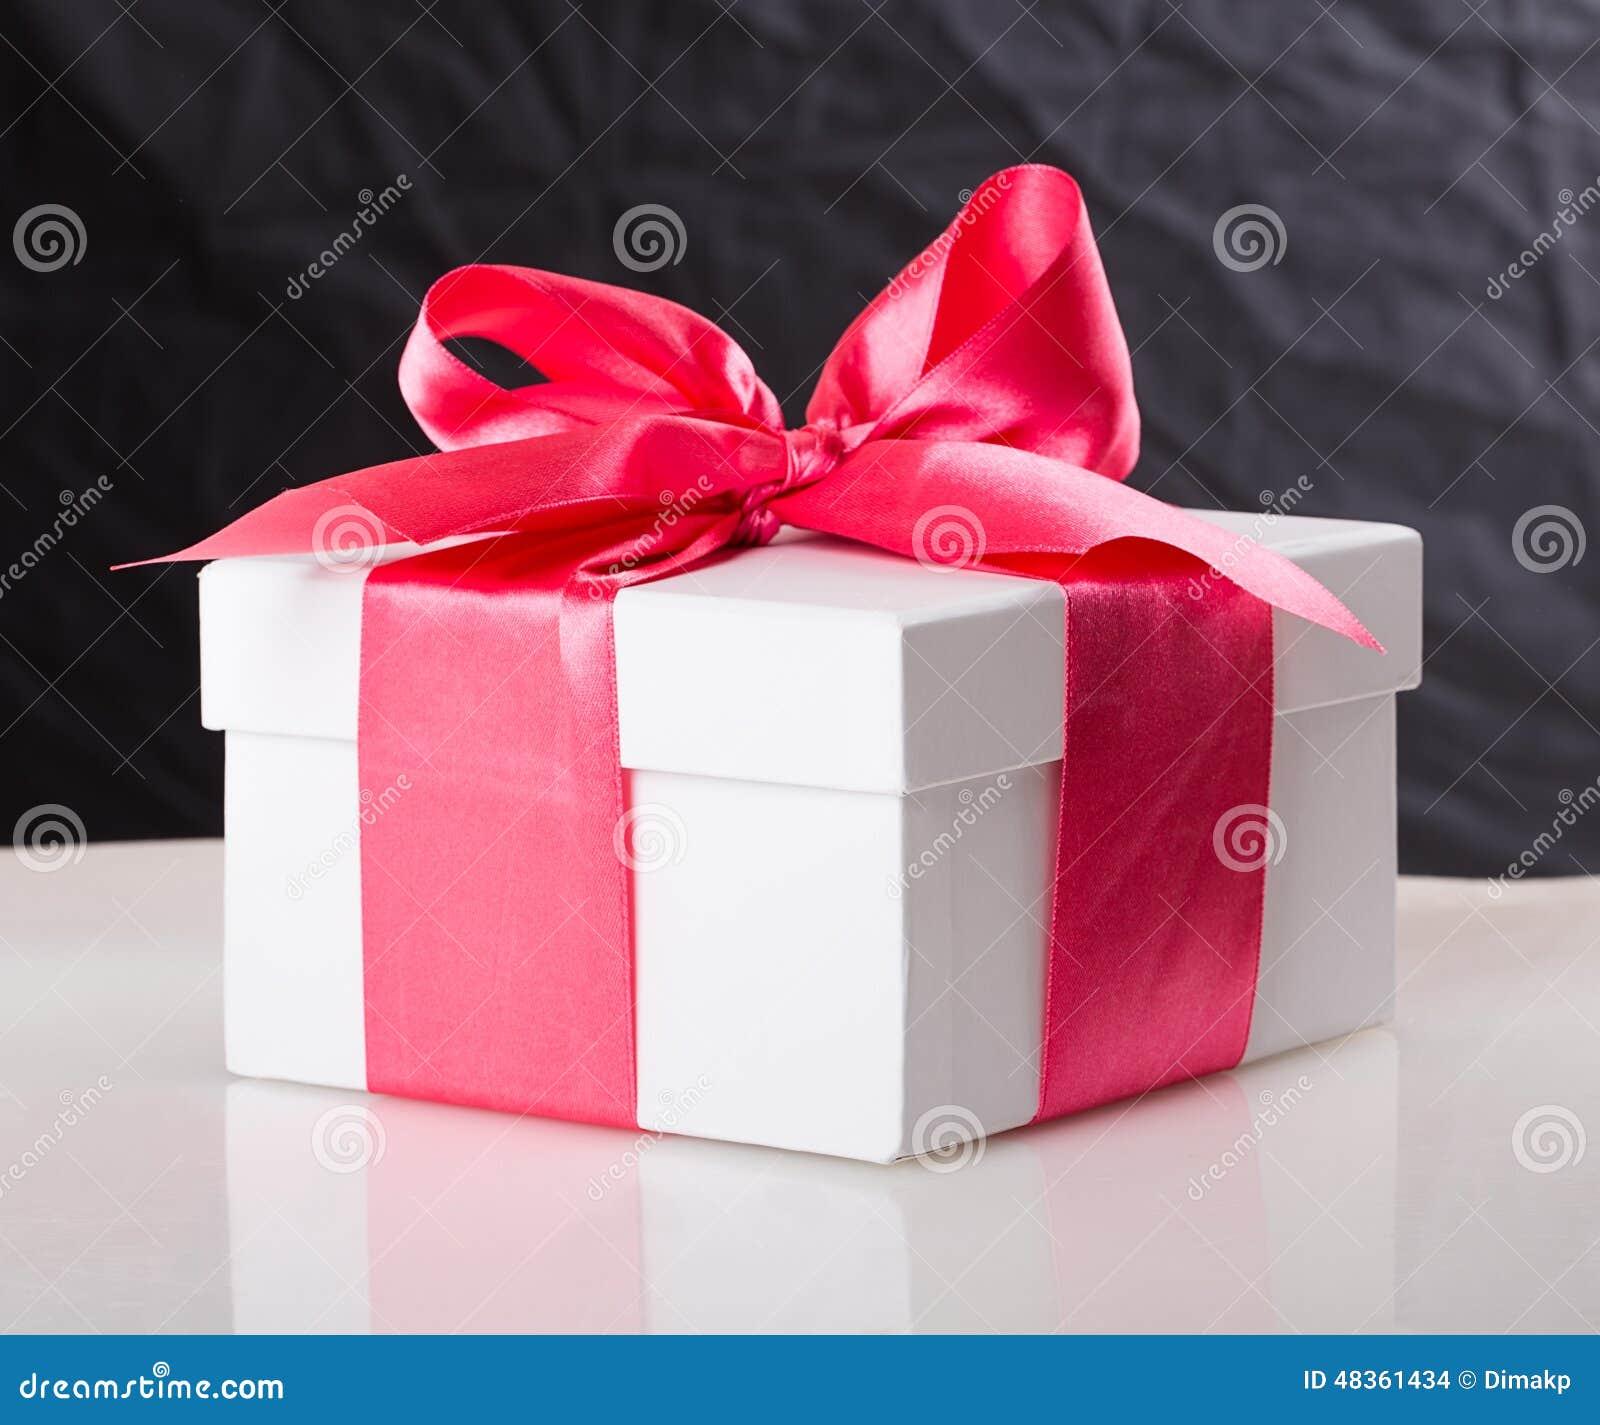 White gift box stock photo. Image of beautiful, event - 48361434